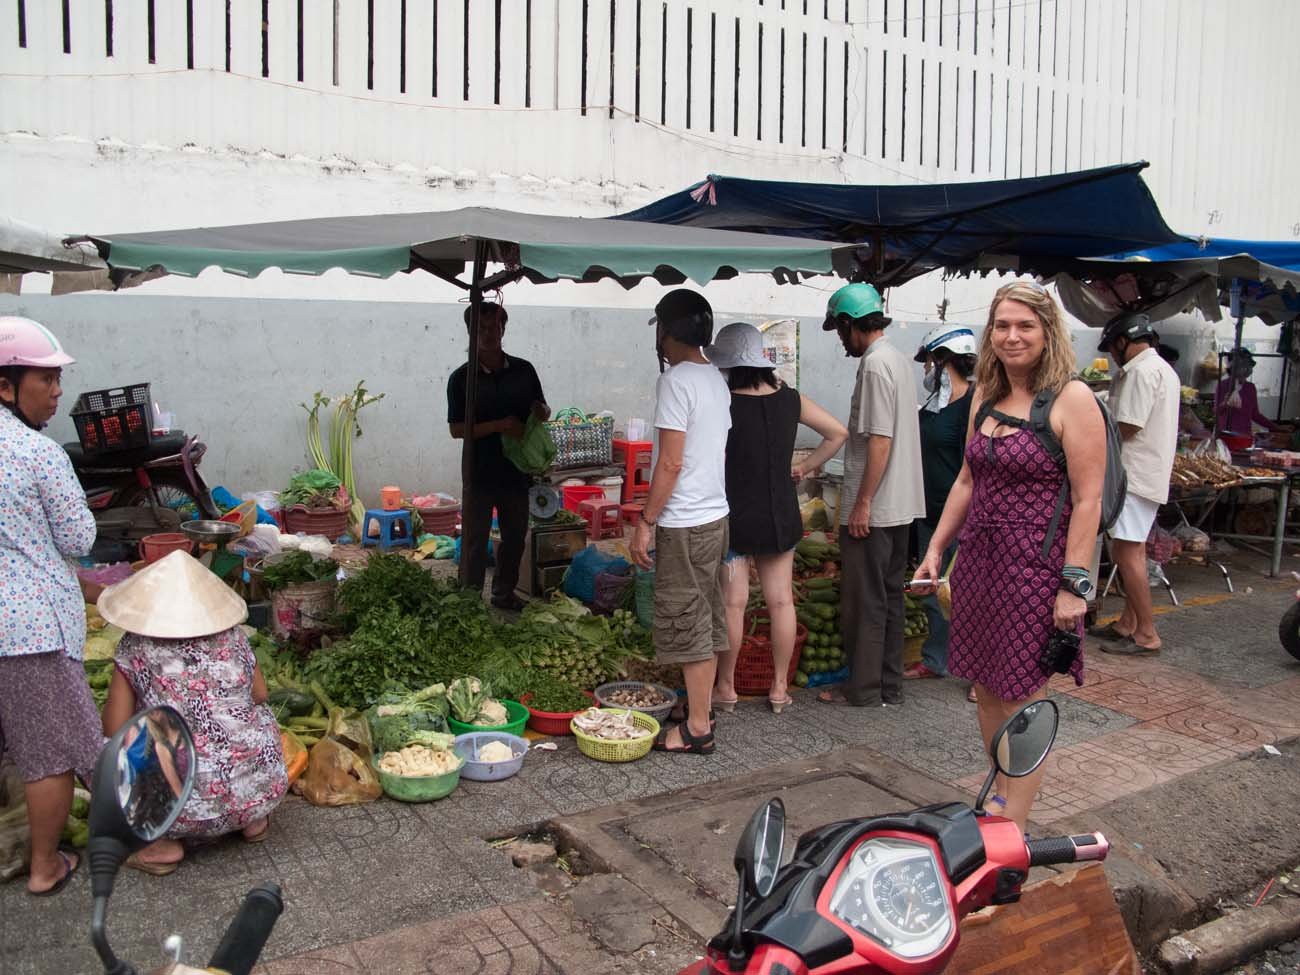 Sidewalk Street Vendors